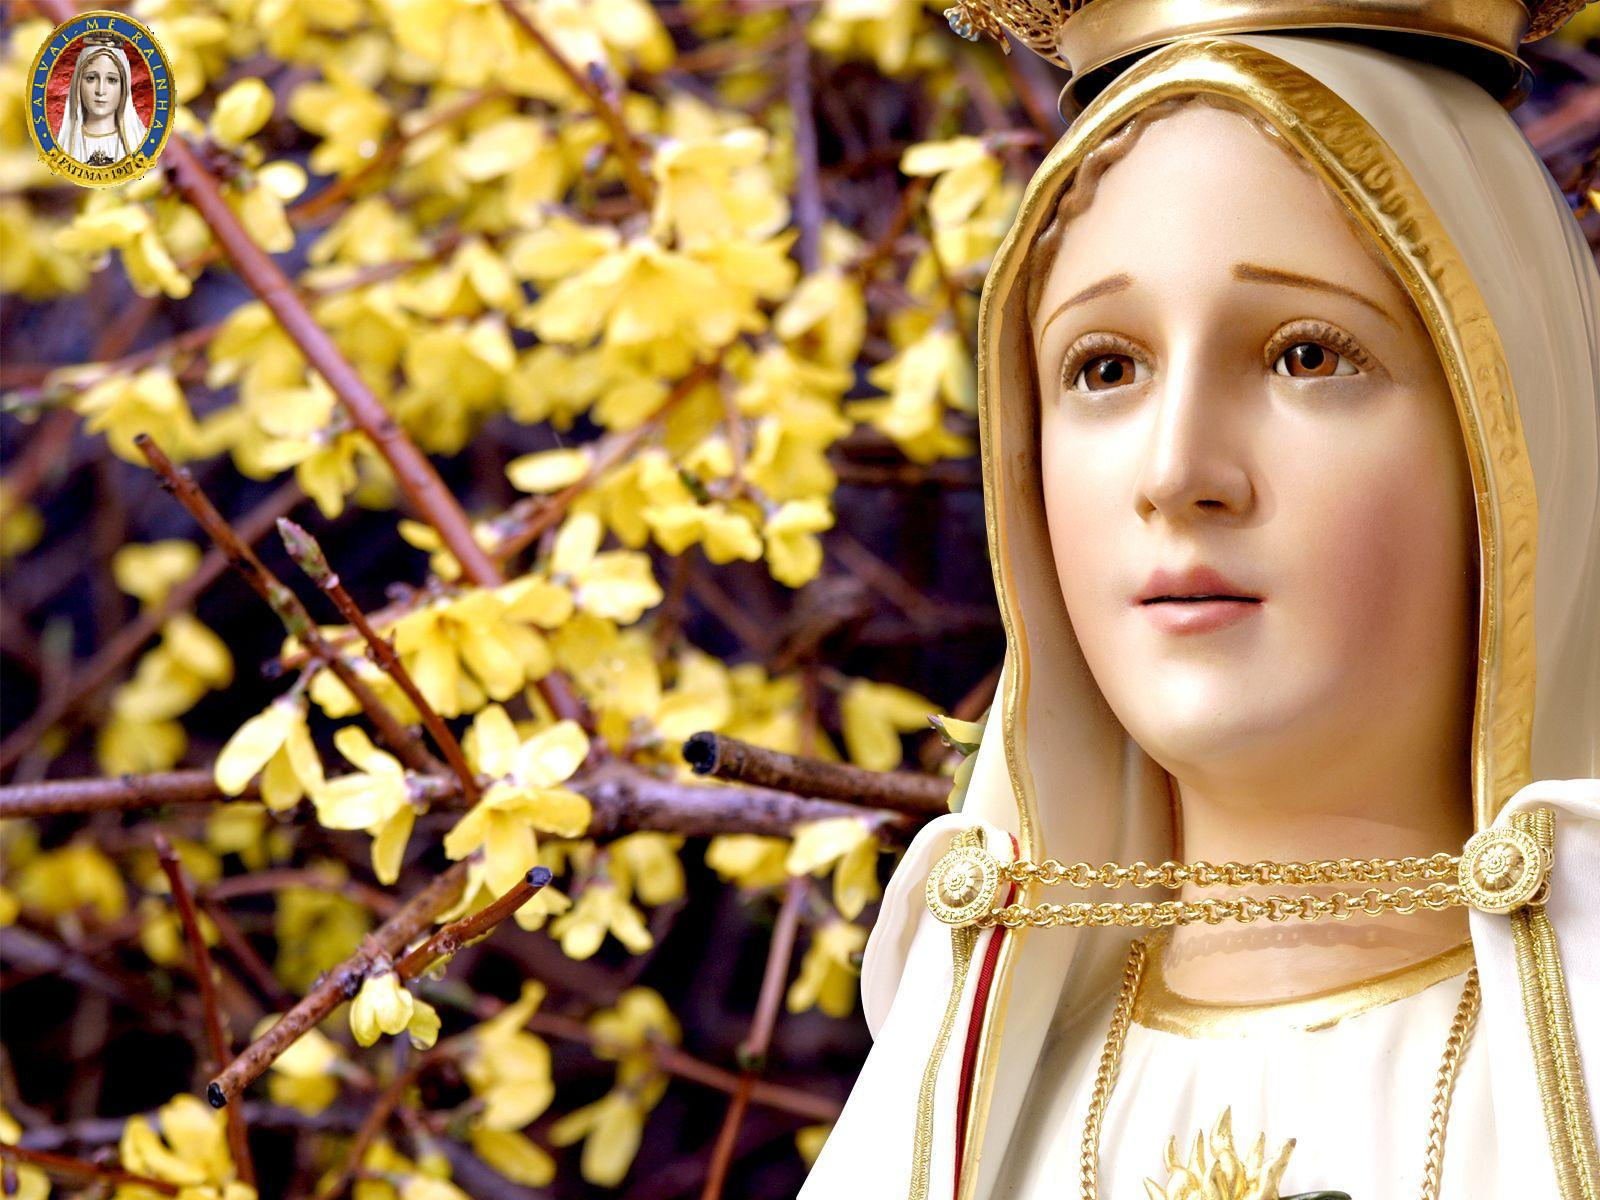 St Rita Of Cascia Beautiful 825879 Hd Wallpaper Backgrounds